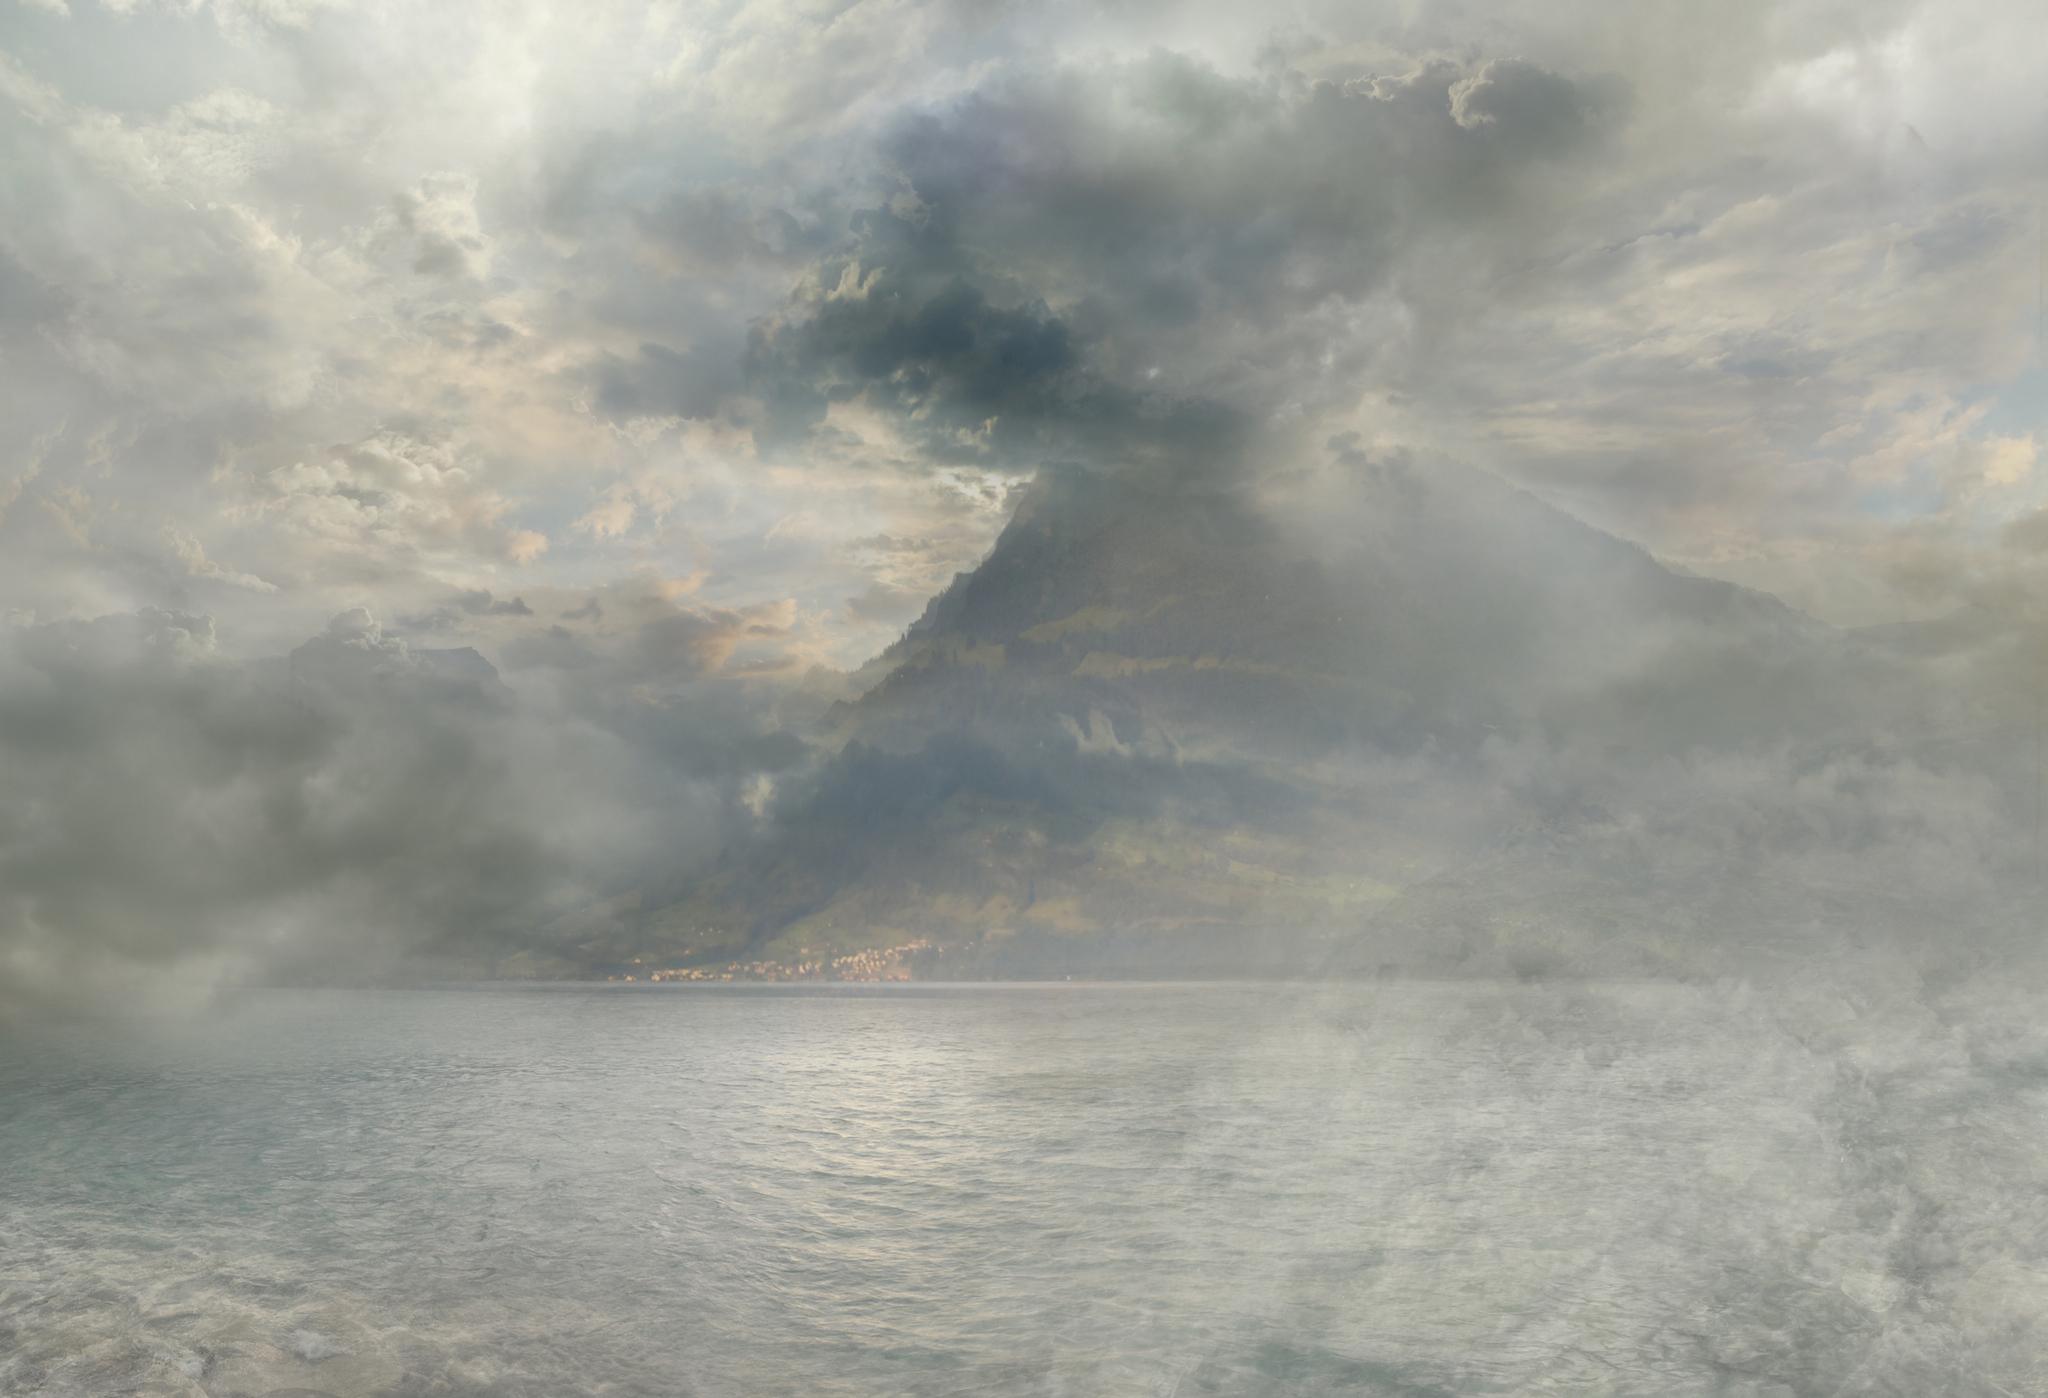 "Hiroyuki Masuyama, ""A Storm over the Rigi"", circa 1844 by Joseph Mallord William Turner, 2014 Diasec LED Lightbox, Auflage 5 + 1 AP, 25 x 37 x 4 cm / Courtesy: Galerie Rothamel Erfurt, Frankfurt M."